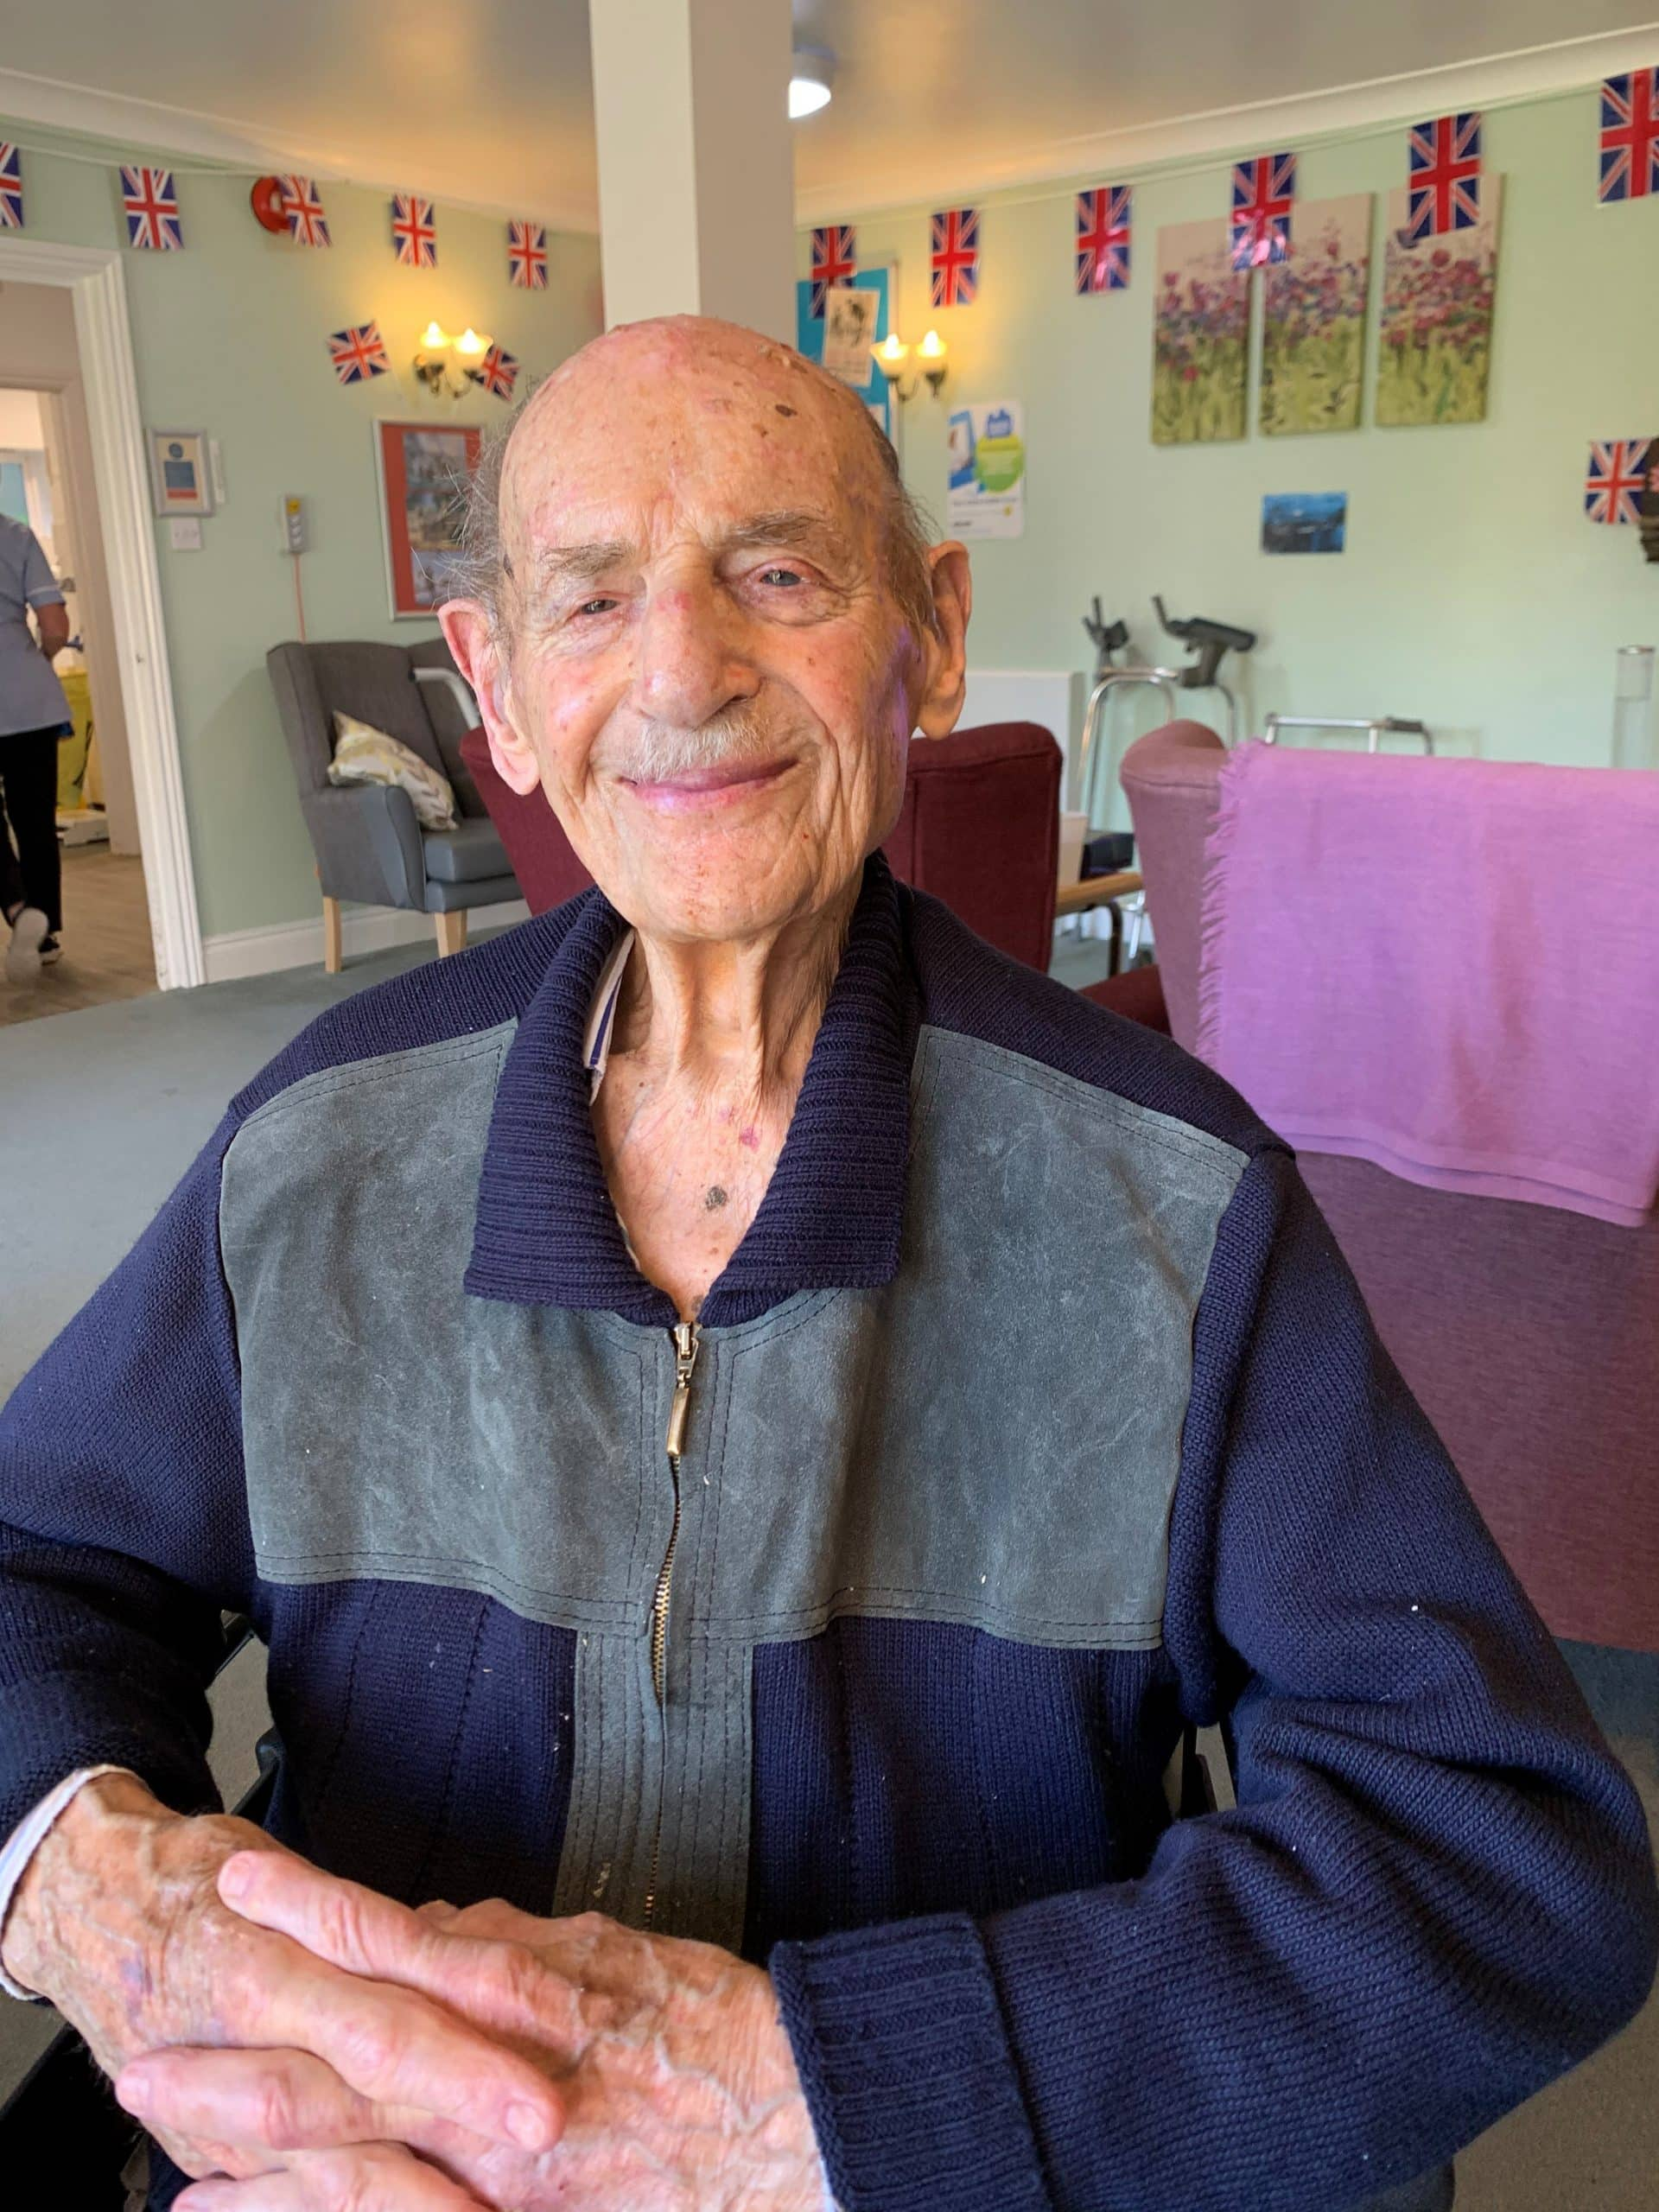 Len Goldman, resident at Patcham Nursing Home